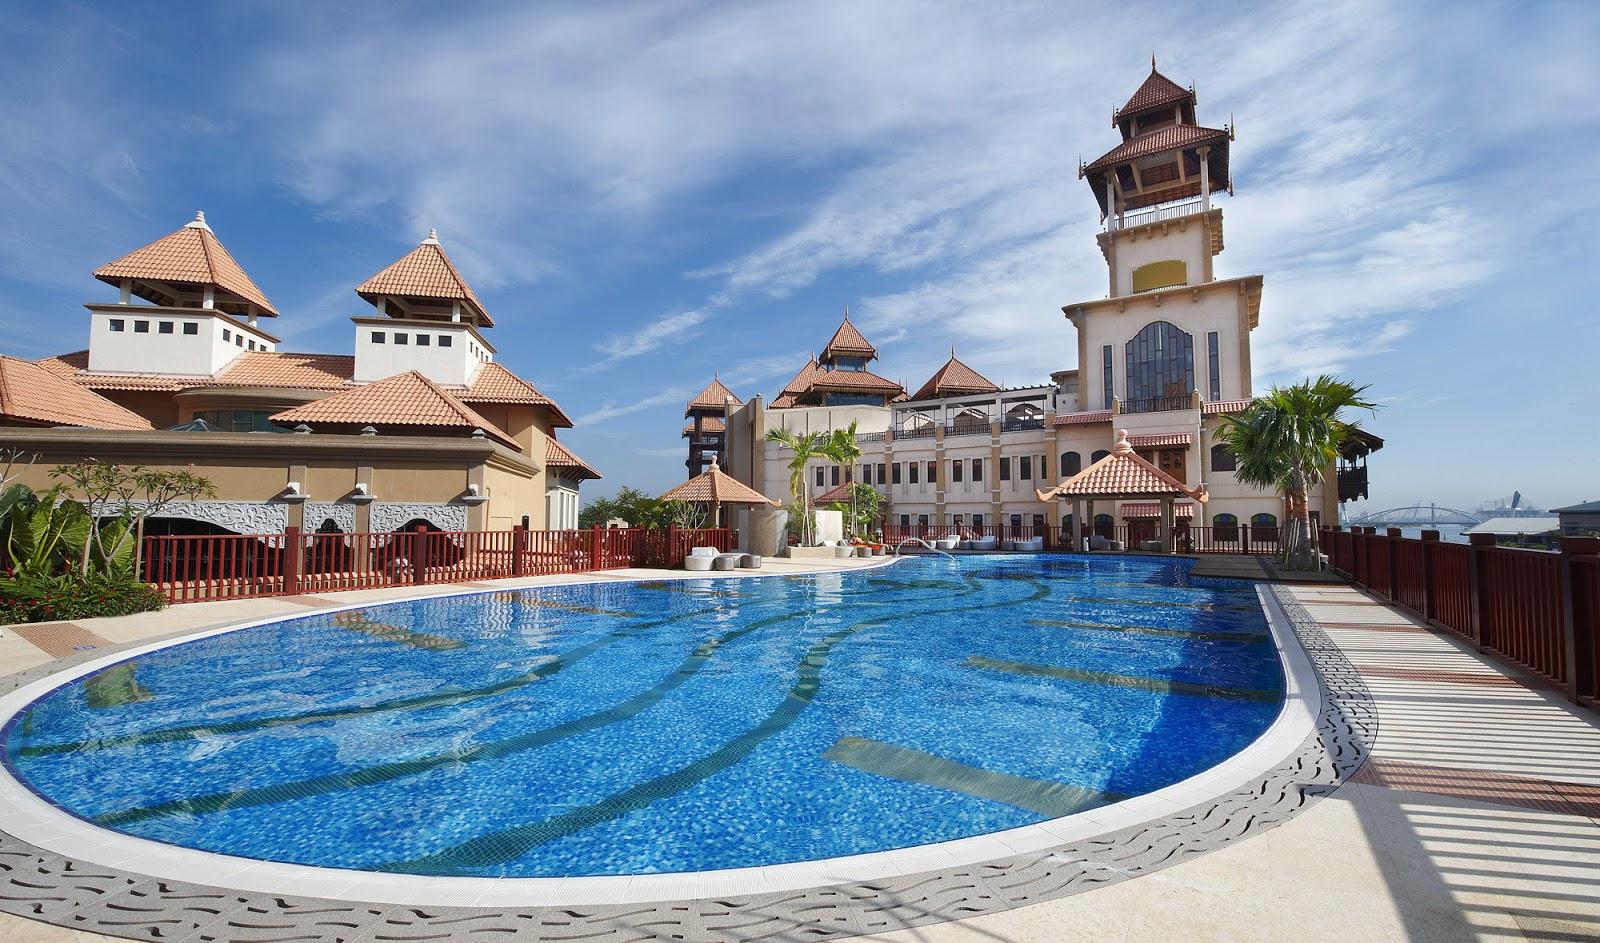 swimming pools putrajaya pictures